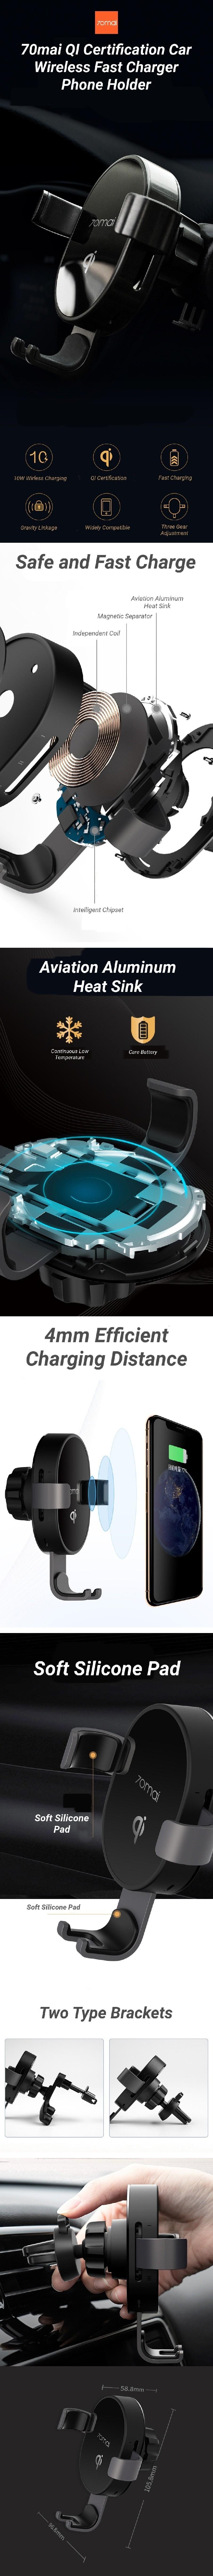 Prezentare-Xiaomi-70Mai-wireless-charger4c18c5990658617c.jpg